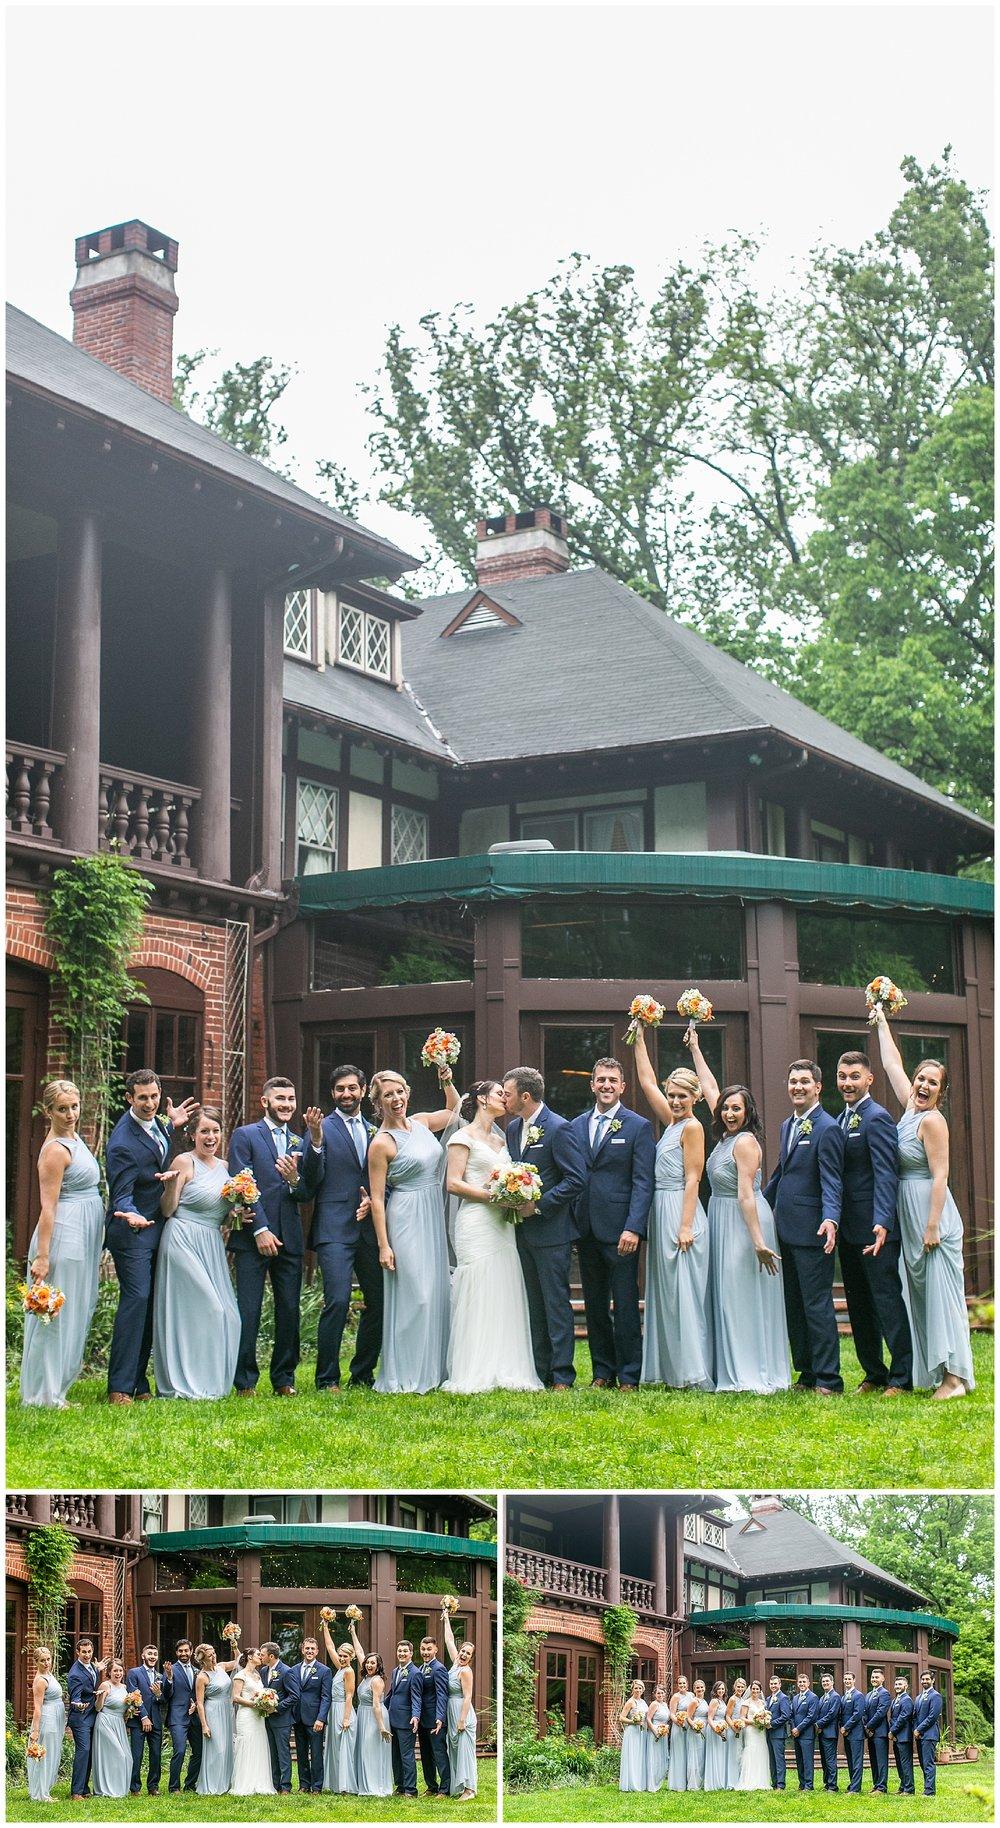 Ashley + Kevin Gramercy Mansion Rainy Day Baltimore Wedding Living Radiant Photography photos_0055.jpg